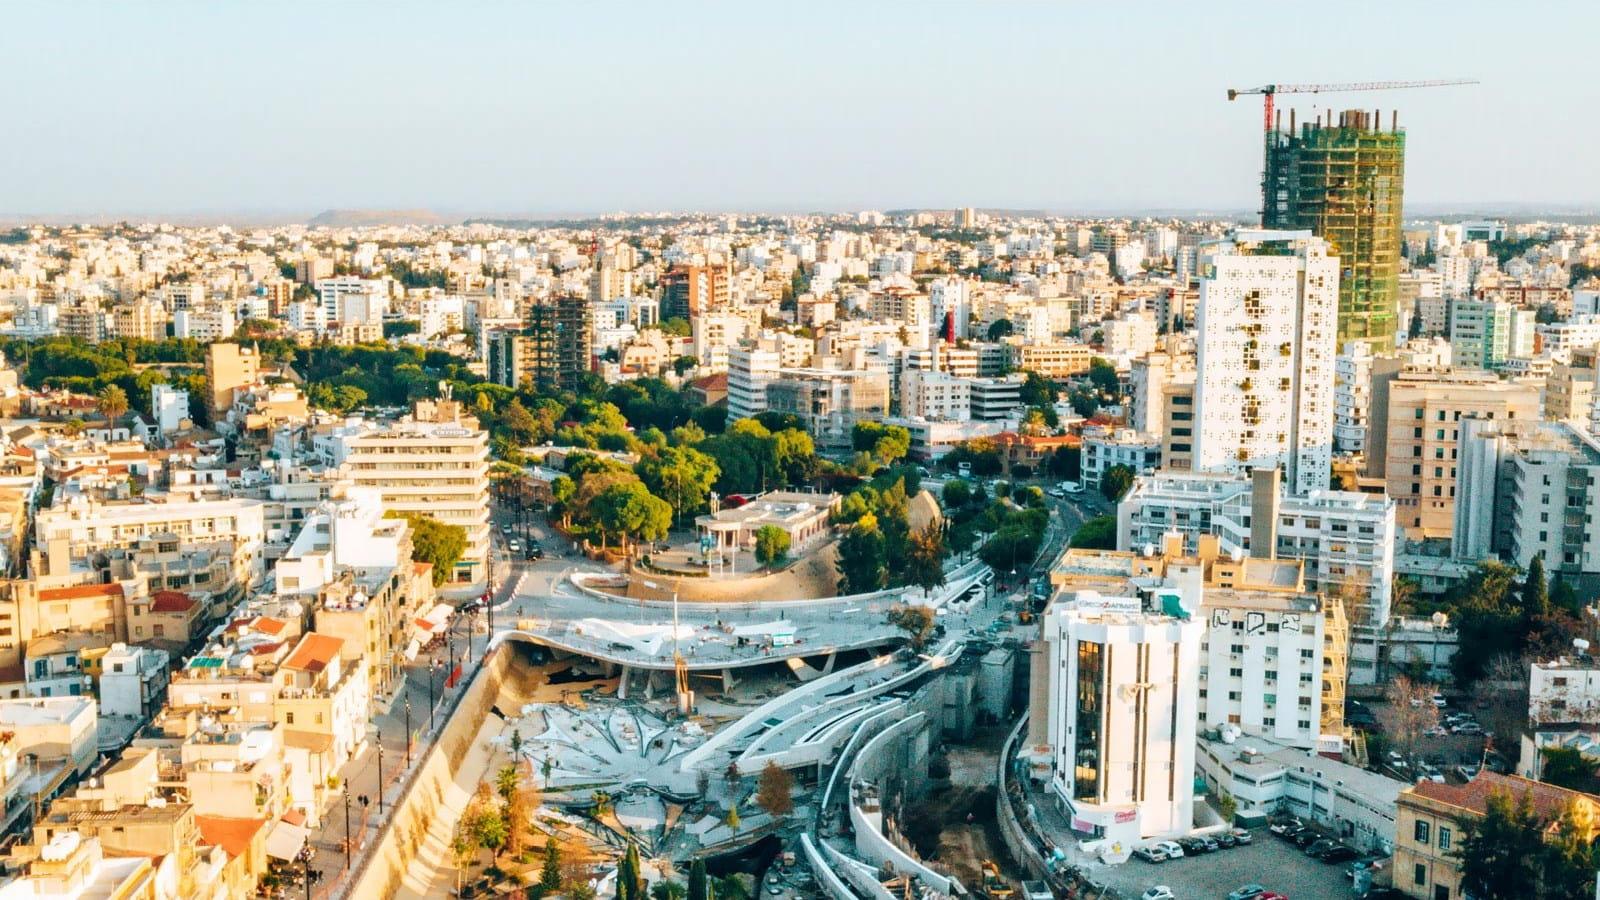 Cyprus skyline